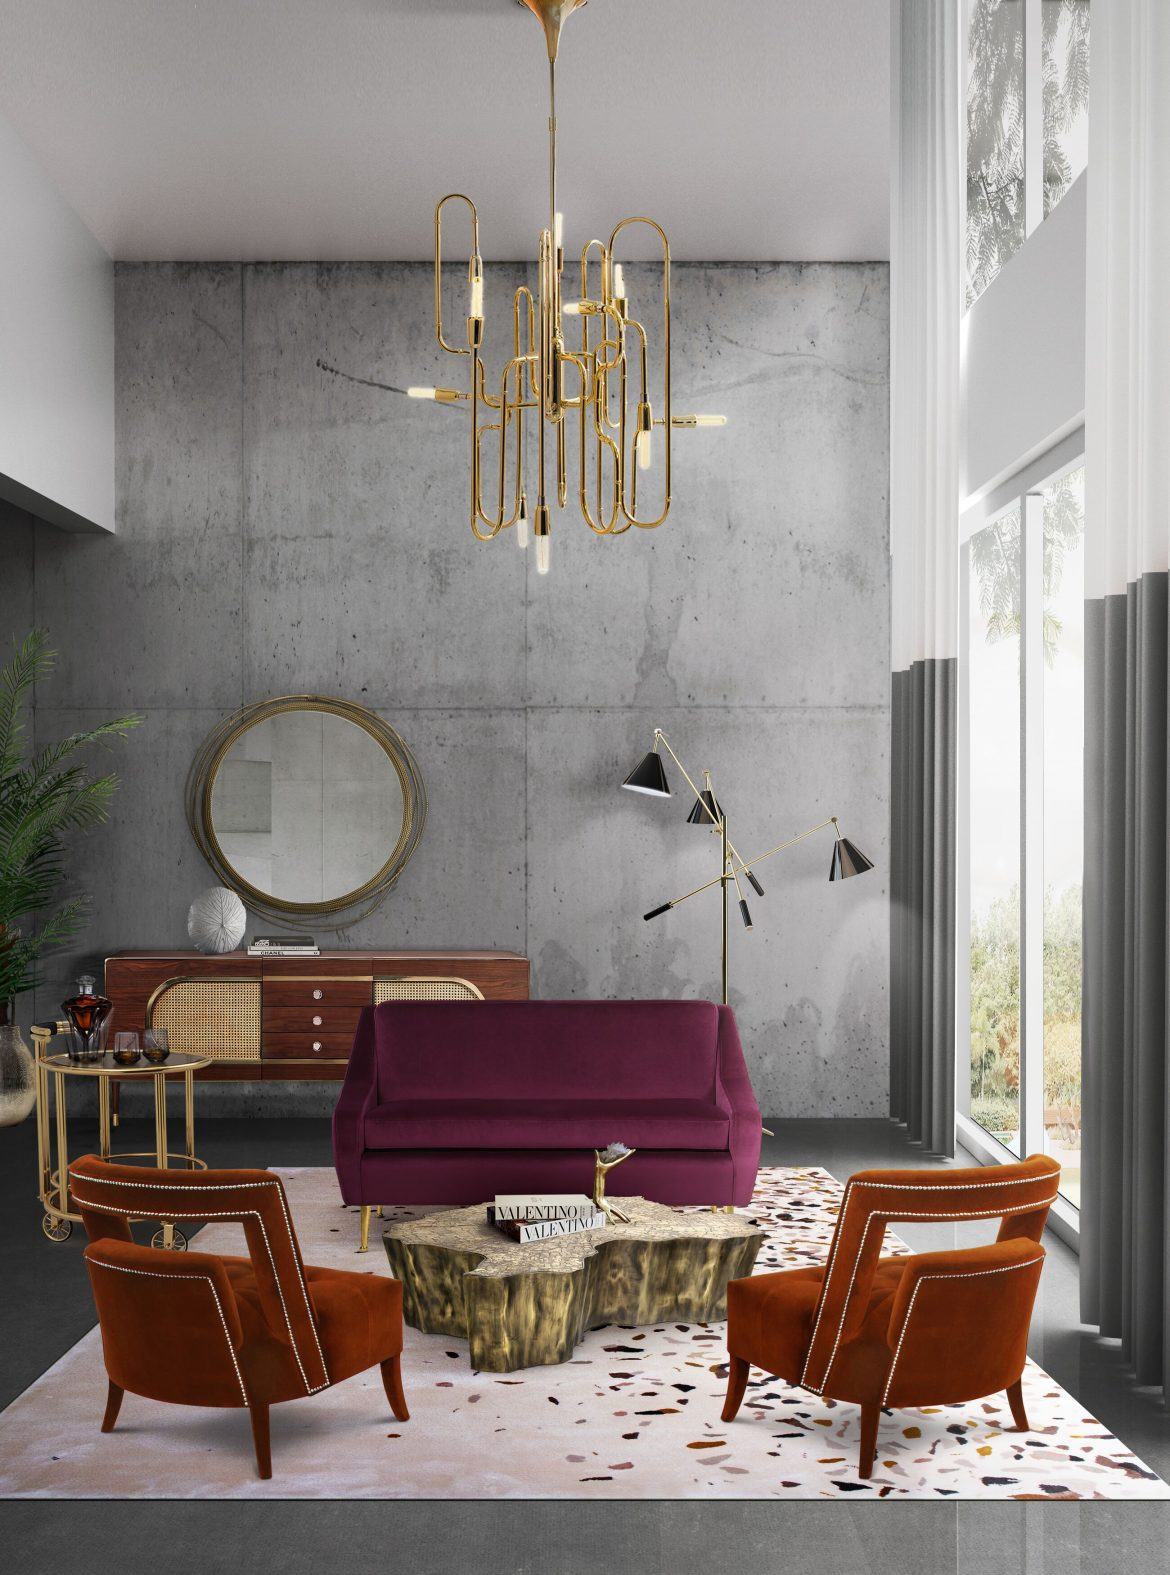 Living Room Ideas: TOP 5 Coffee Table living room ideas Living Room Ideas: TOP 5 Coffee Tables Living Room Ideas TOP 5 Coffee Table 5